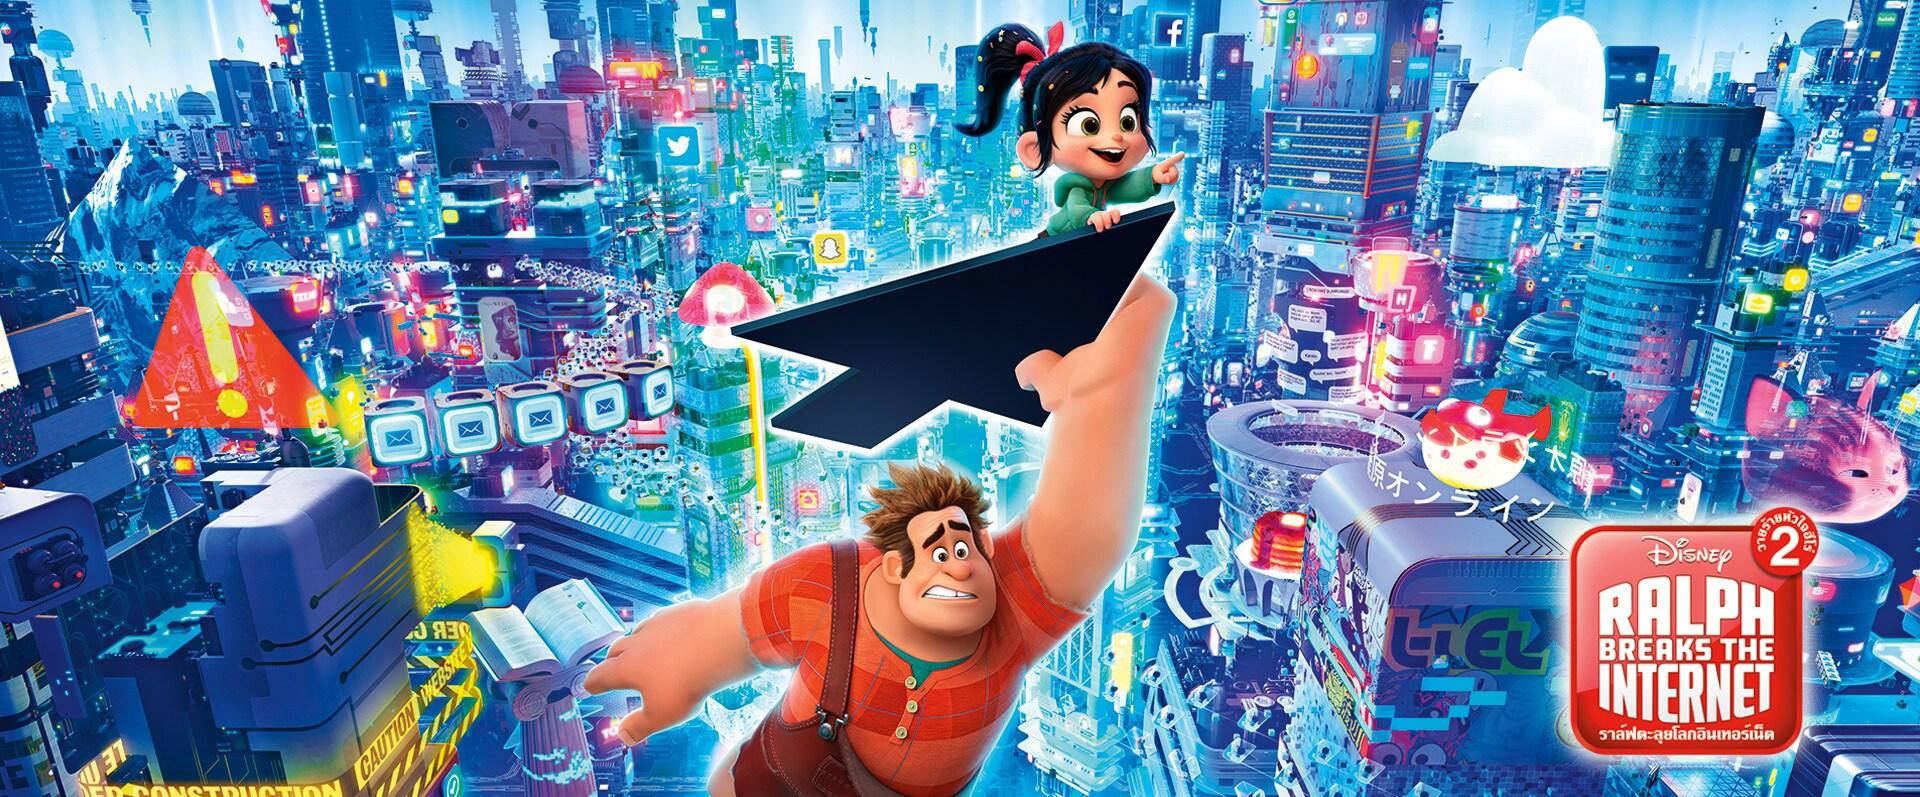 Ralph Breaks The Internet | Movies | Homepage | Disney